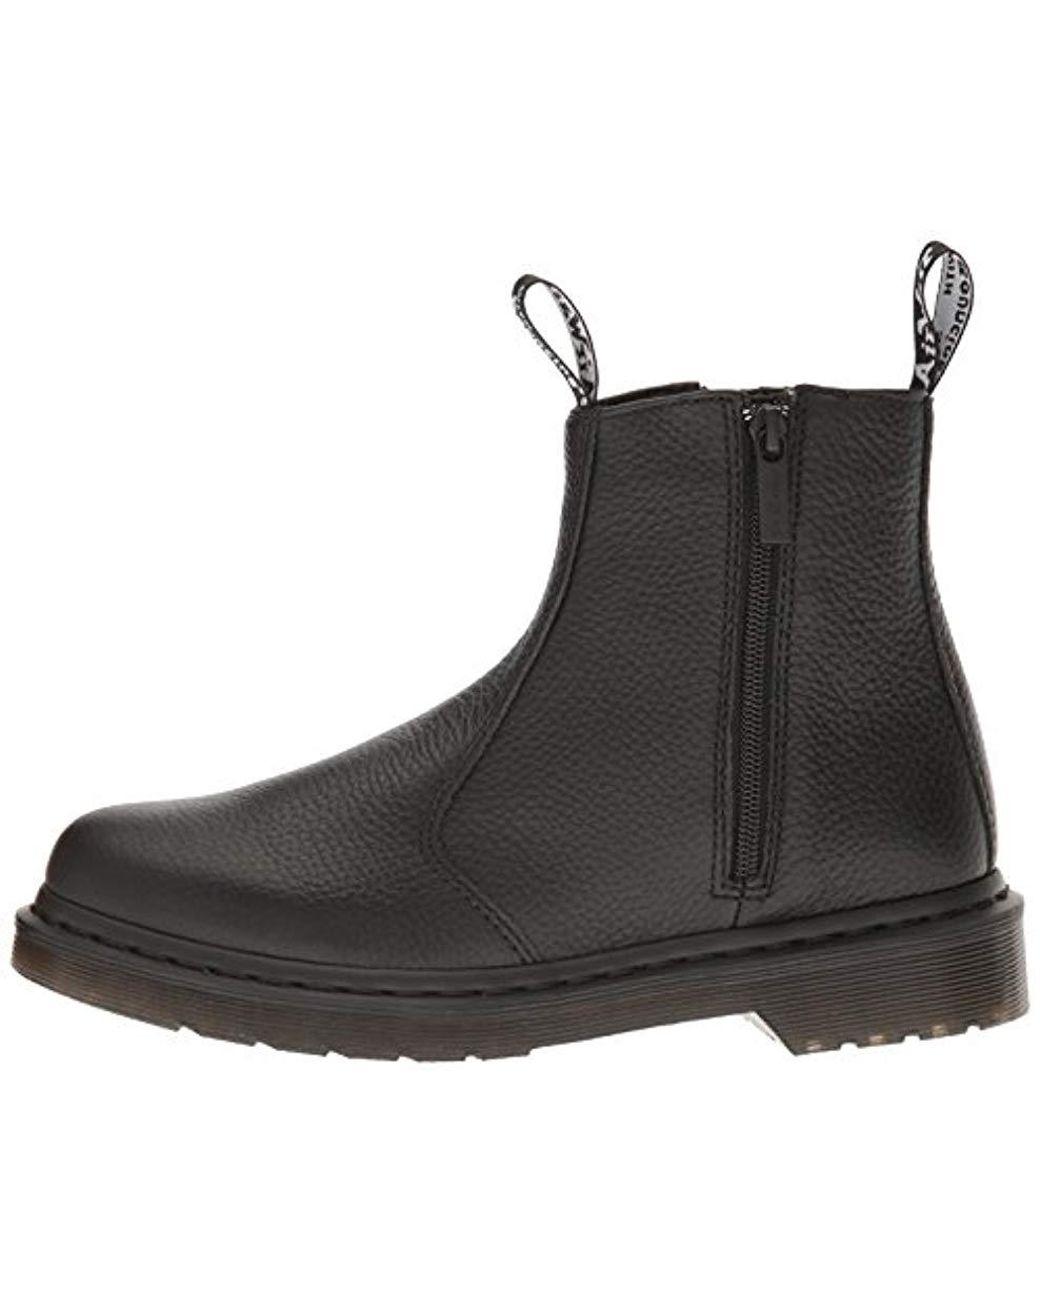 276ca2b59 Dr. Martens 2976 W/zips Chelsea Boots in Black - Lyst